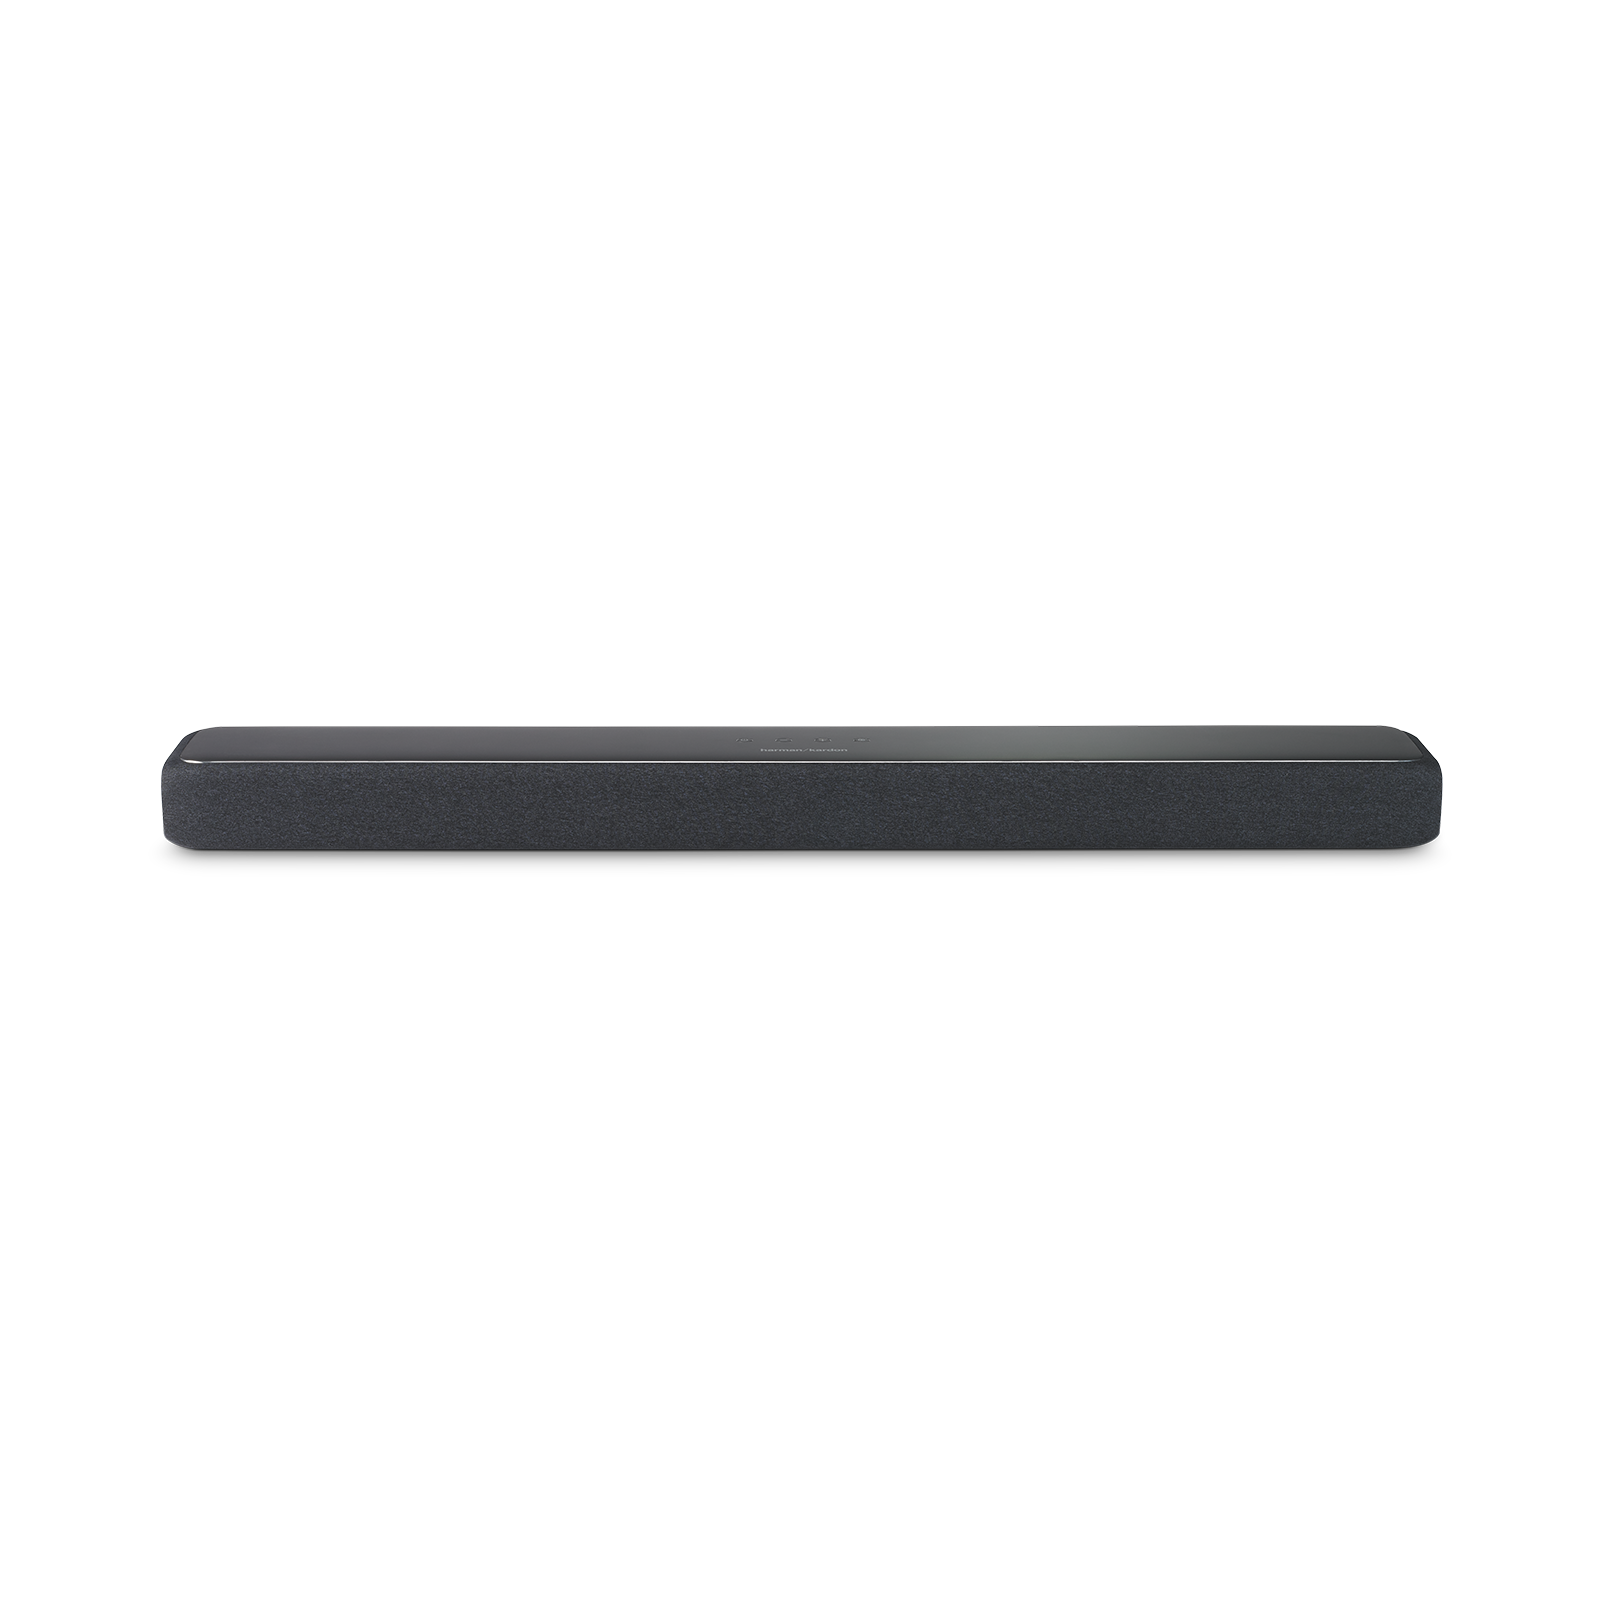 Harman Kardon Enchant 800 8-Channel Soundbar with Multibeam (refurb) $199.99 + Free Shipping